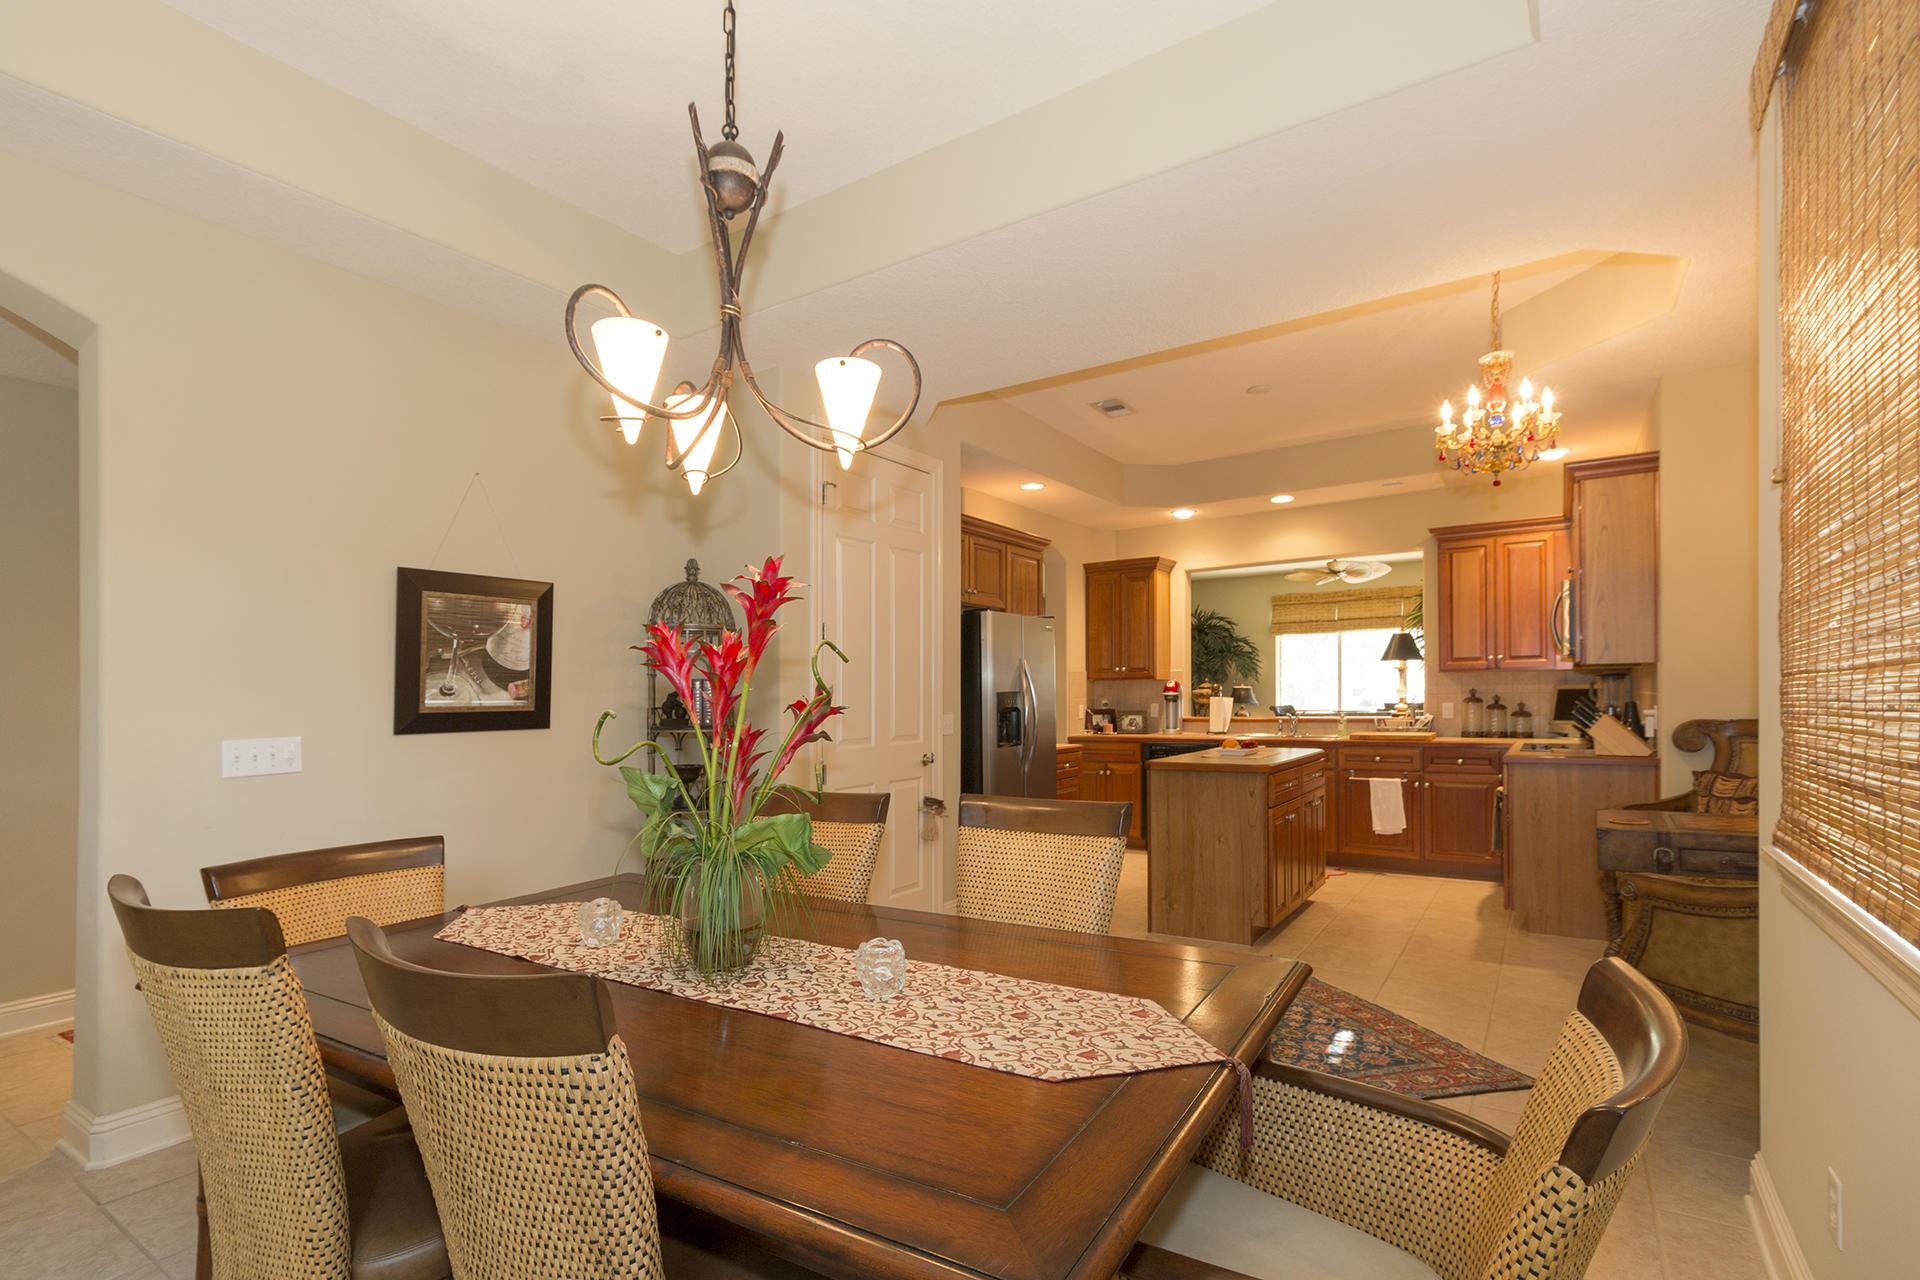 4520 Golf Villa Court - $525000